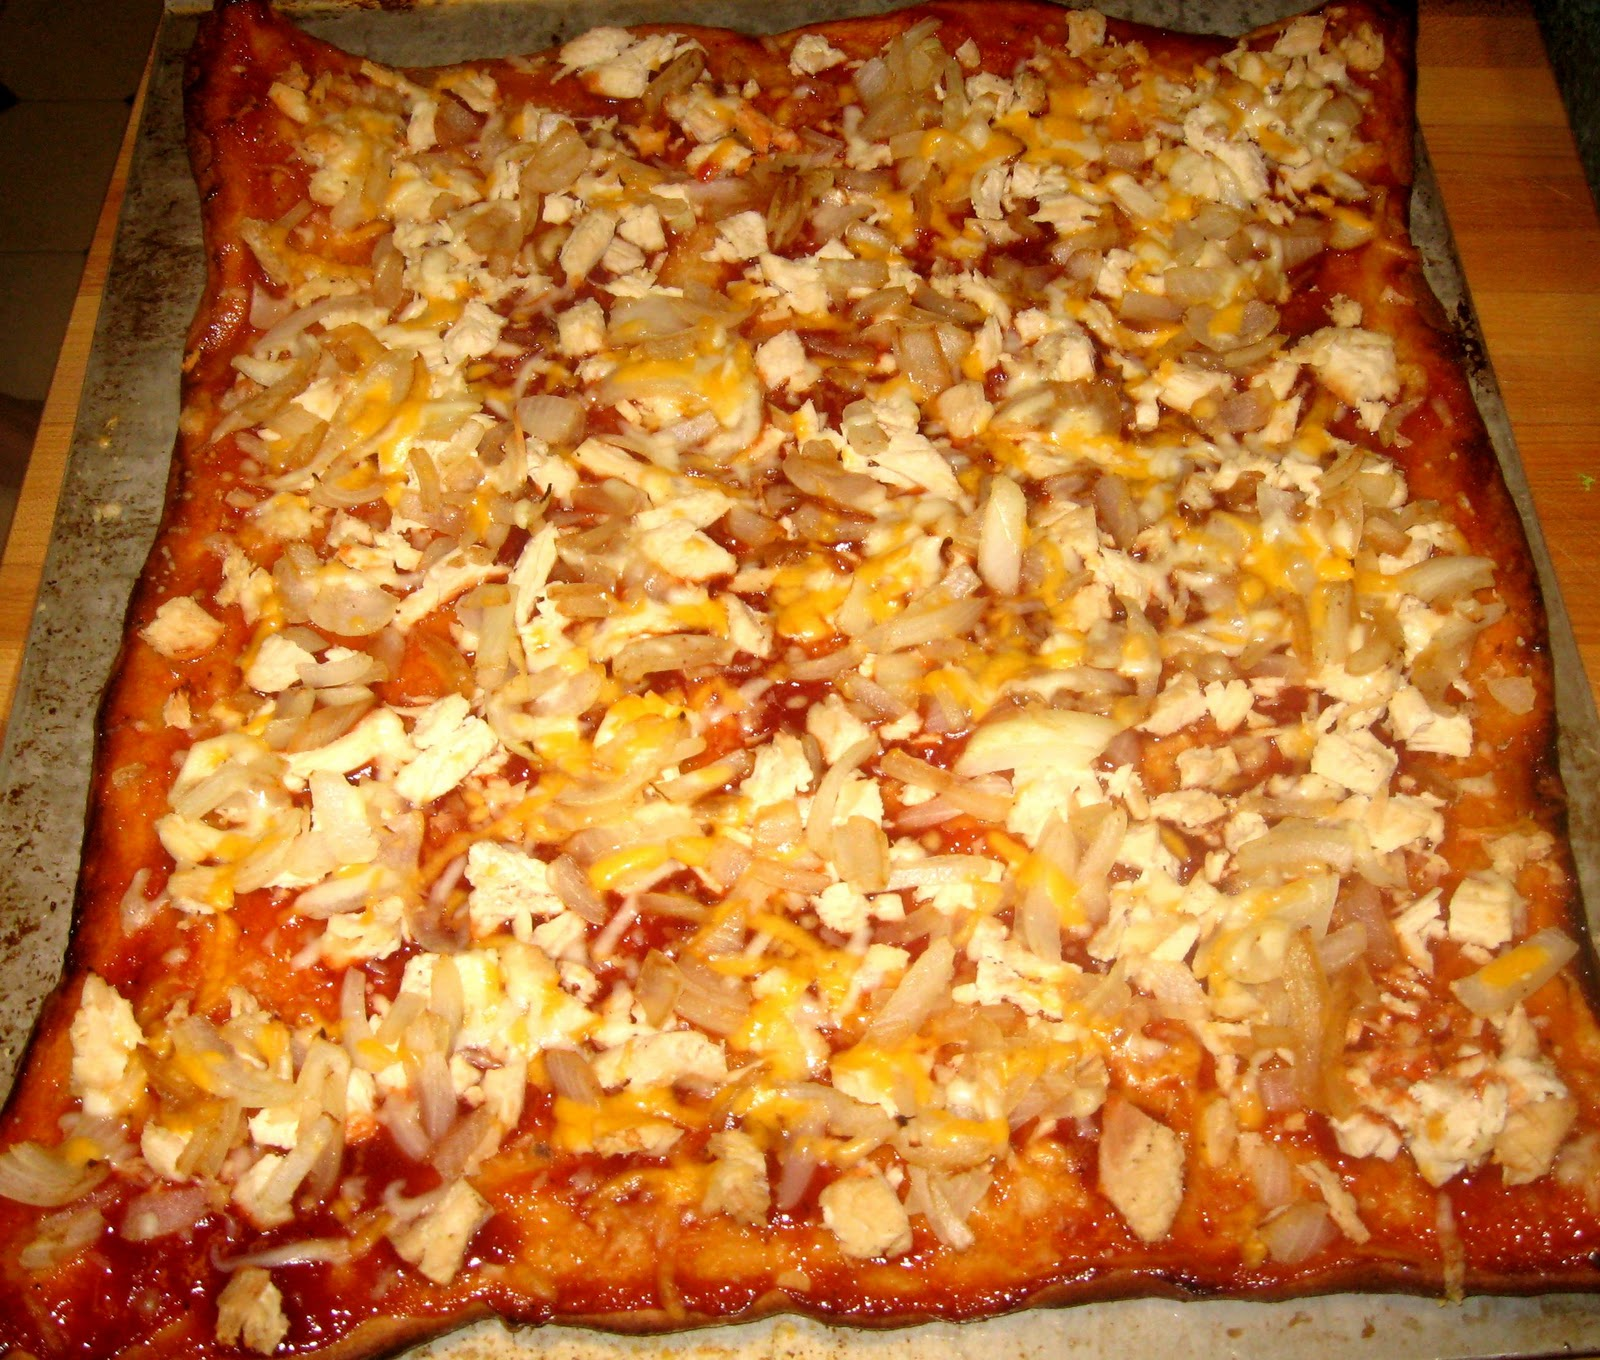 Debbi Does Dinner... Healthy & Low Calorie: Turkey Leftovers?